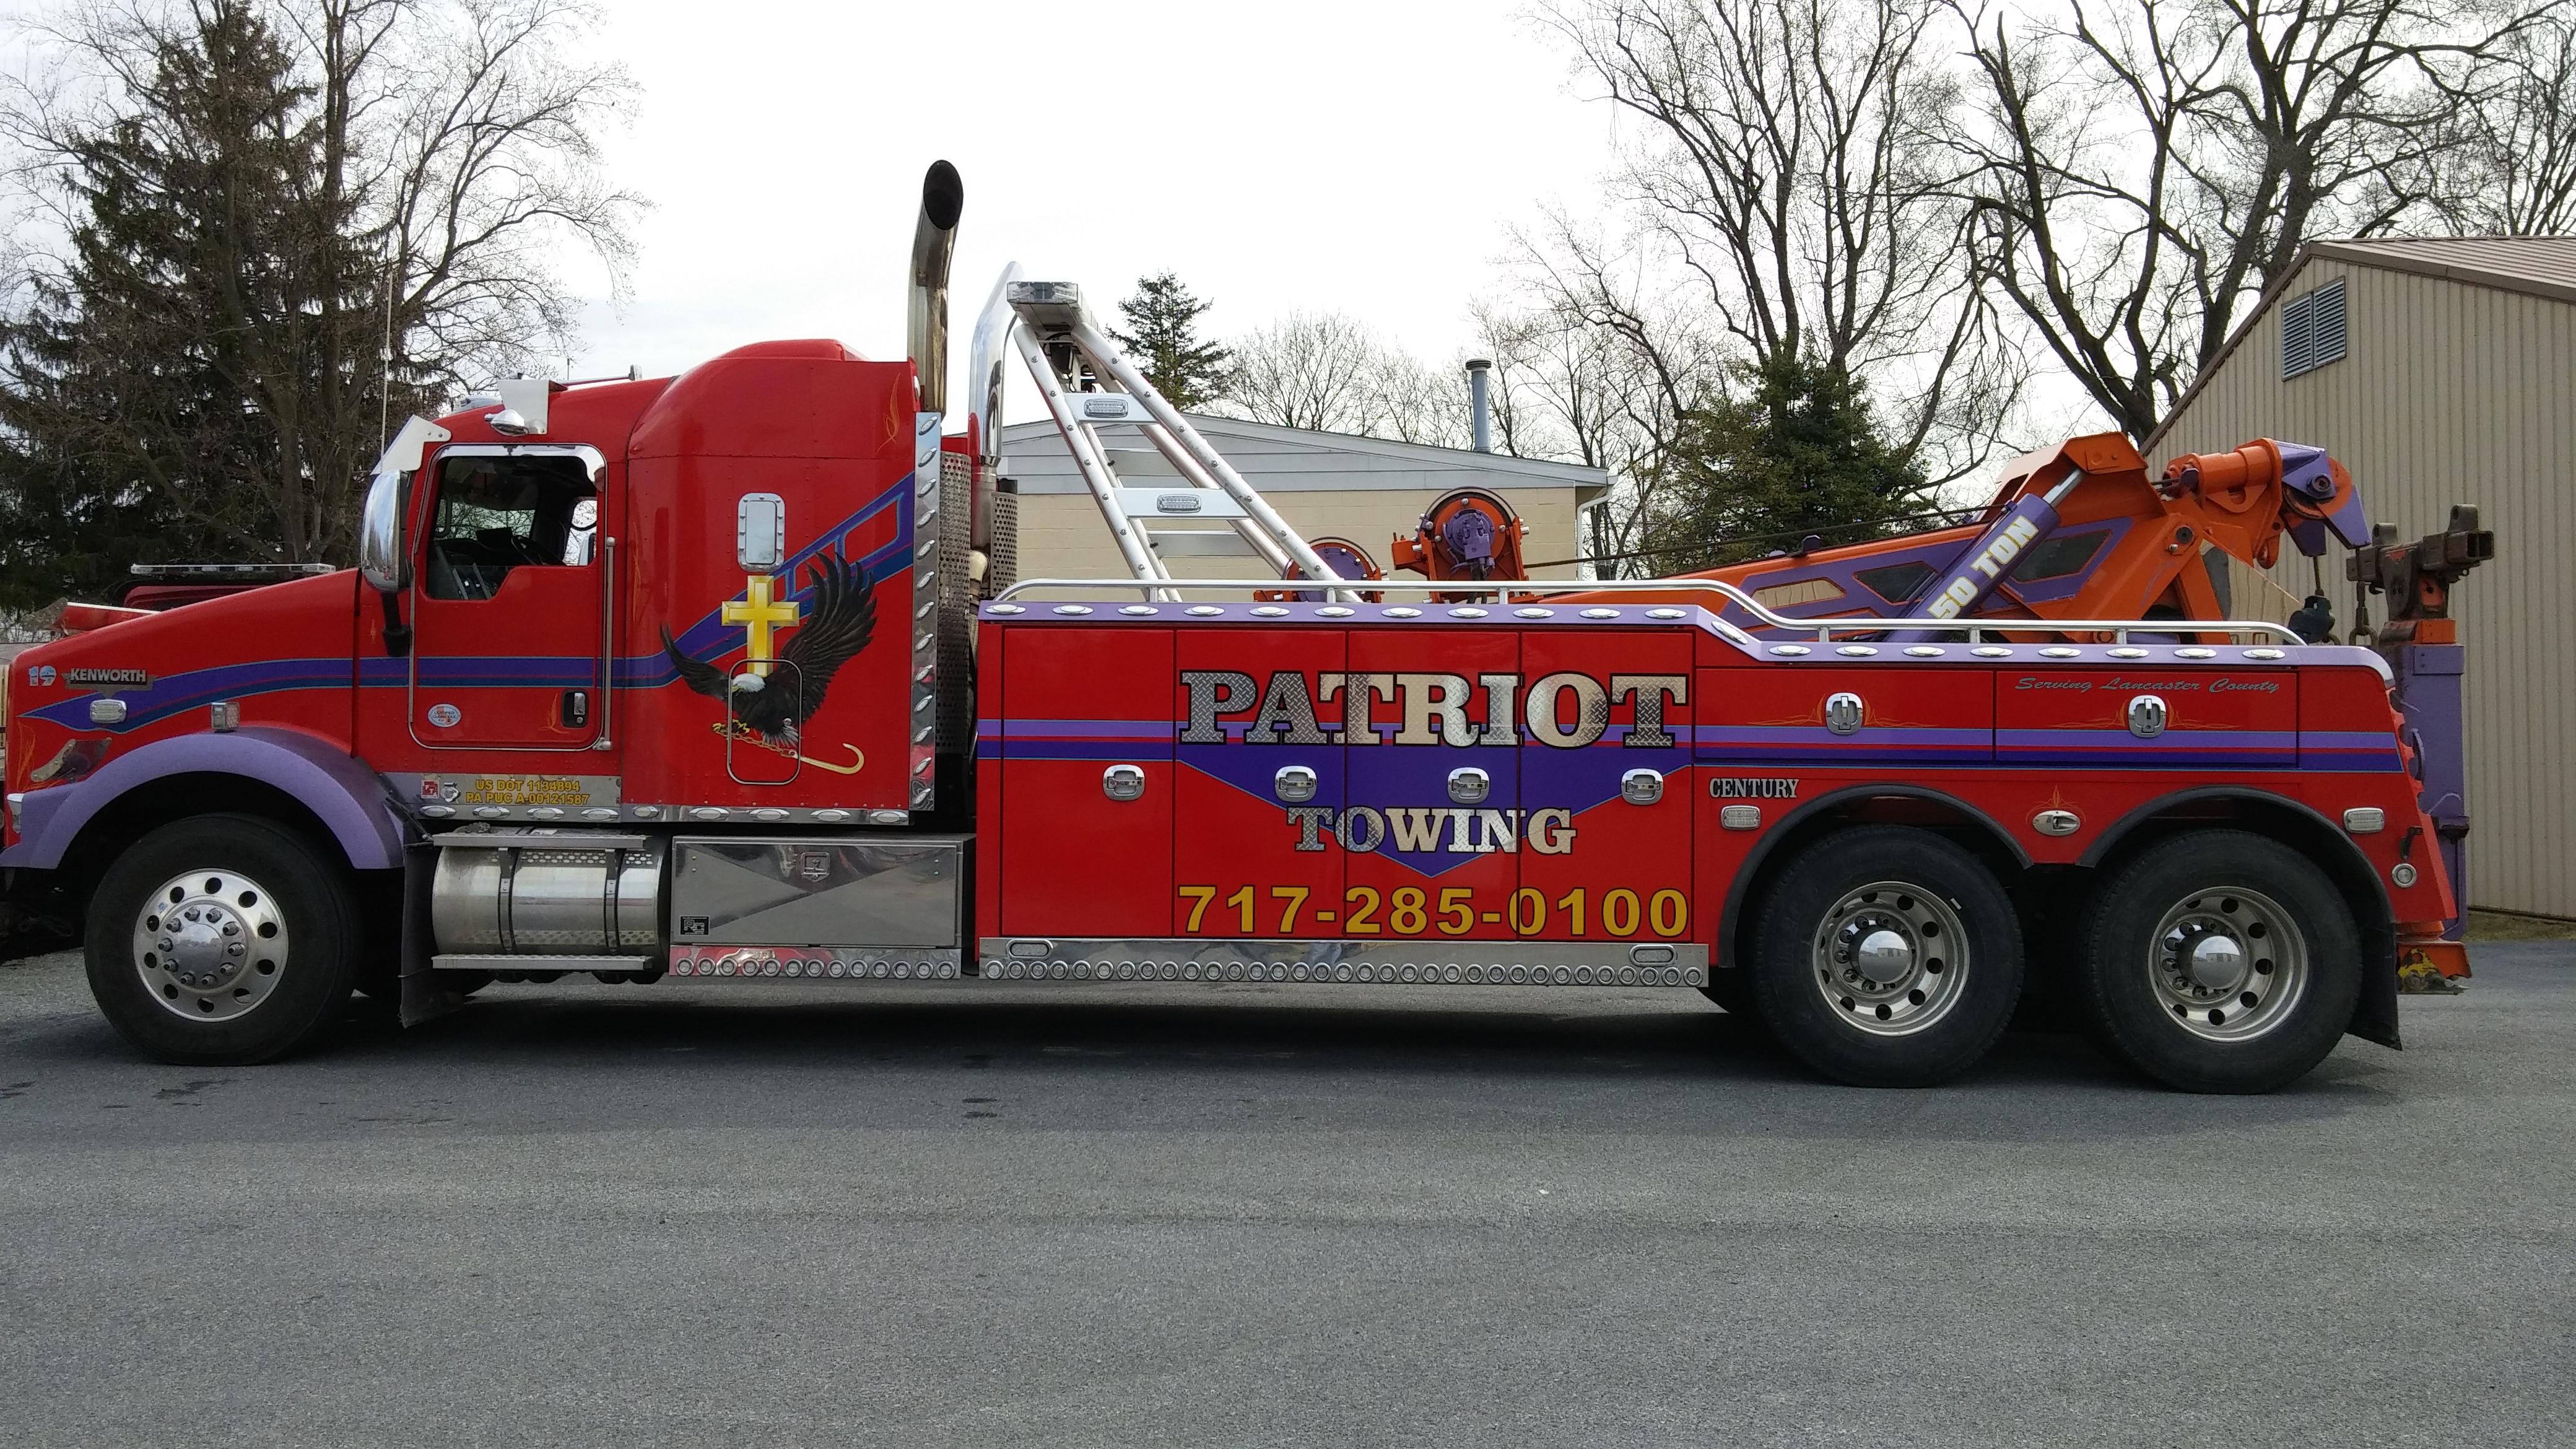 Patriot Towing